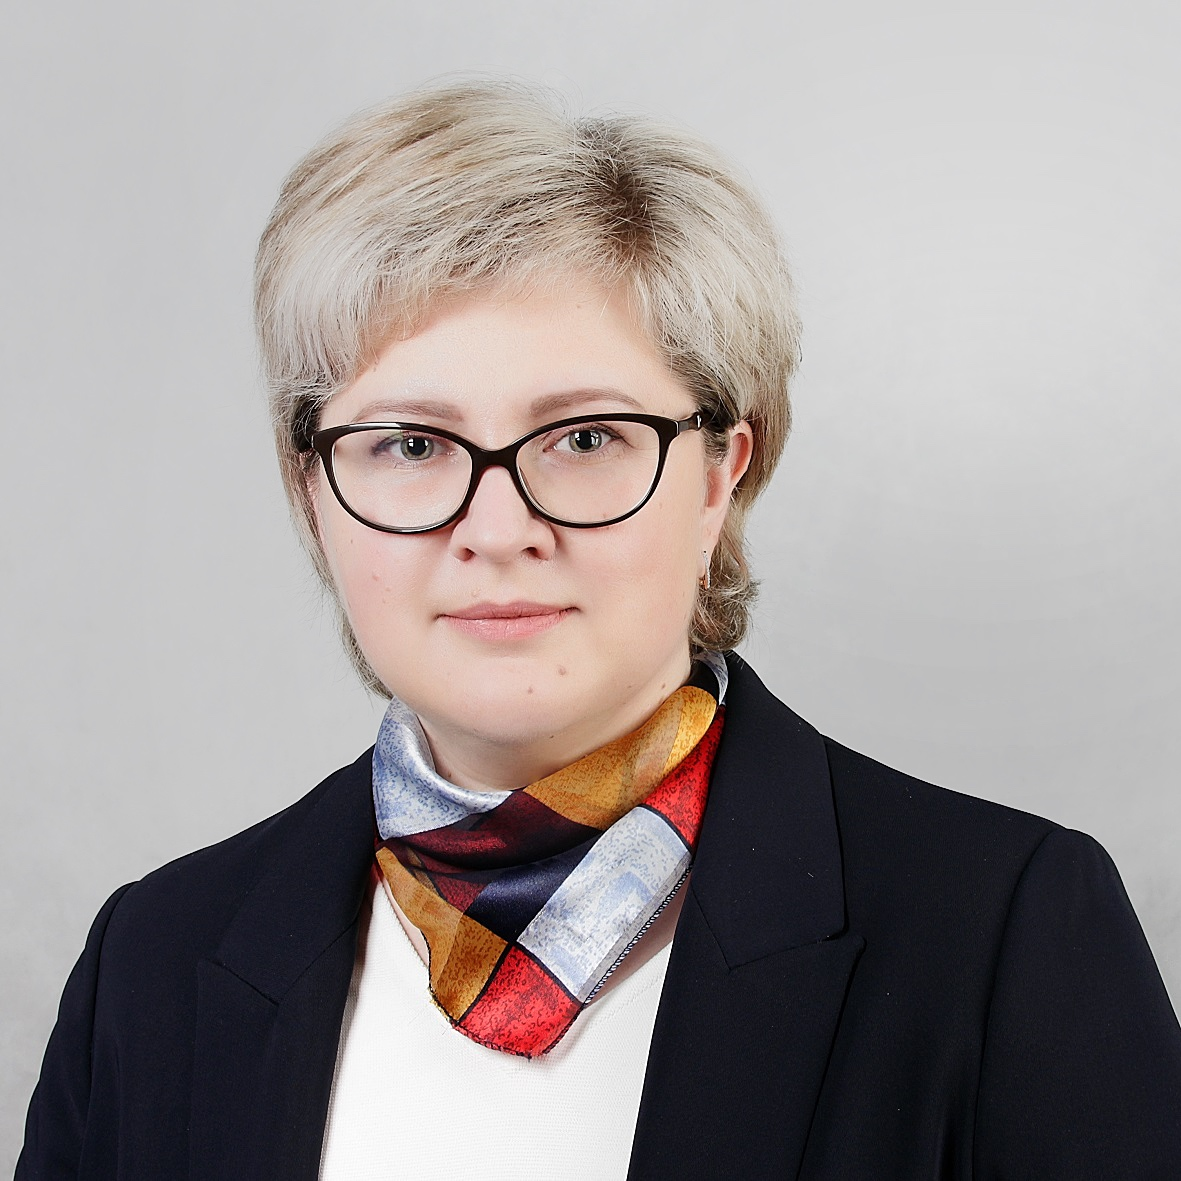 Тивьяева Ирина Владимировна